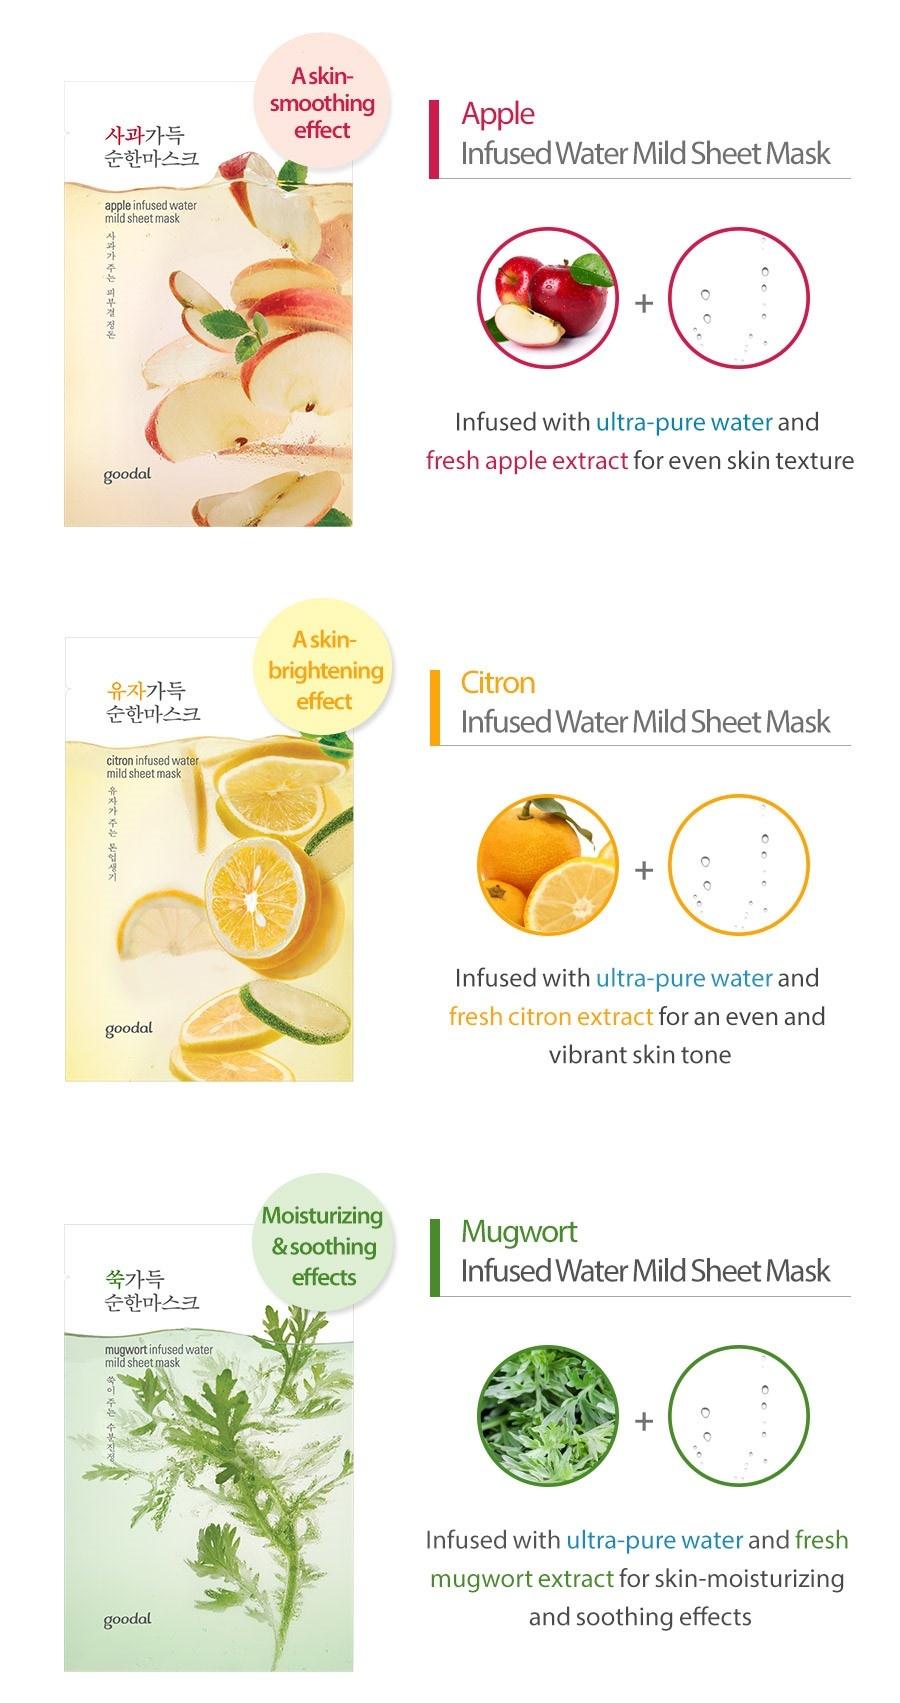 greentea infused water mild sheet mask-5